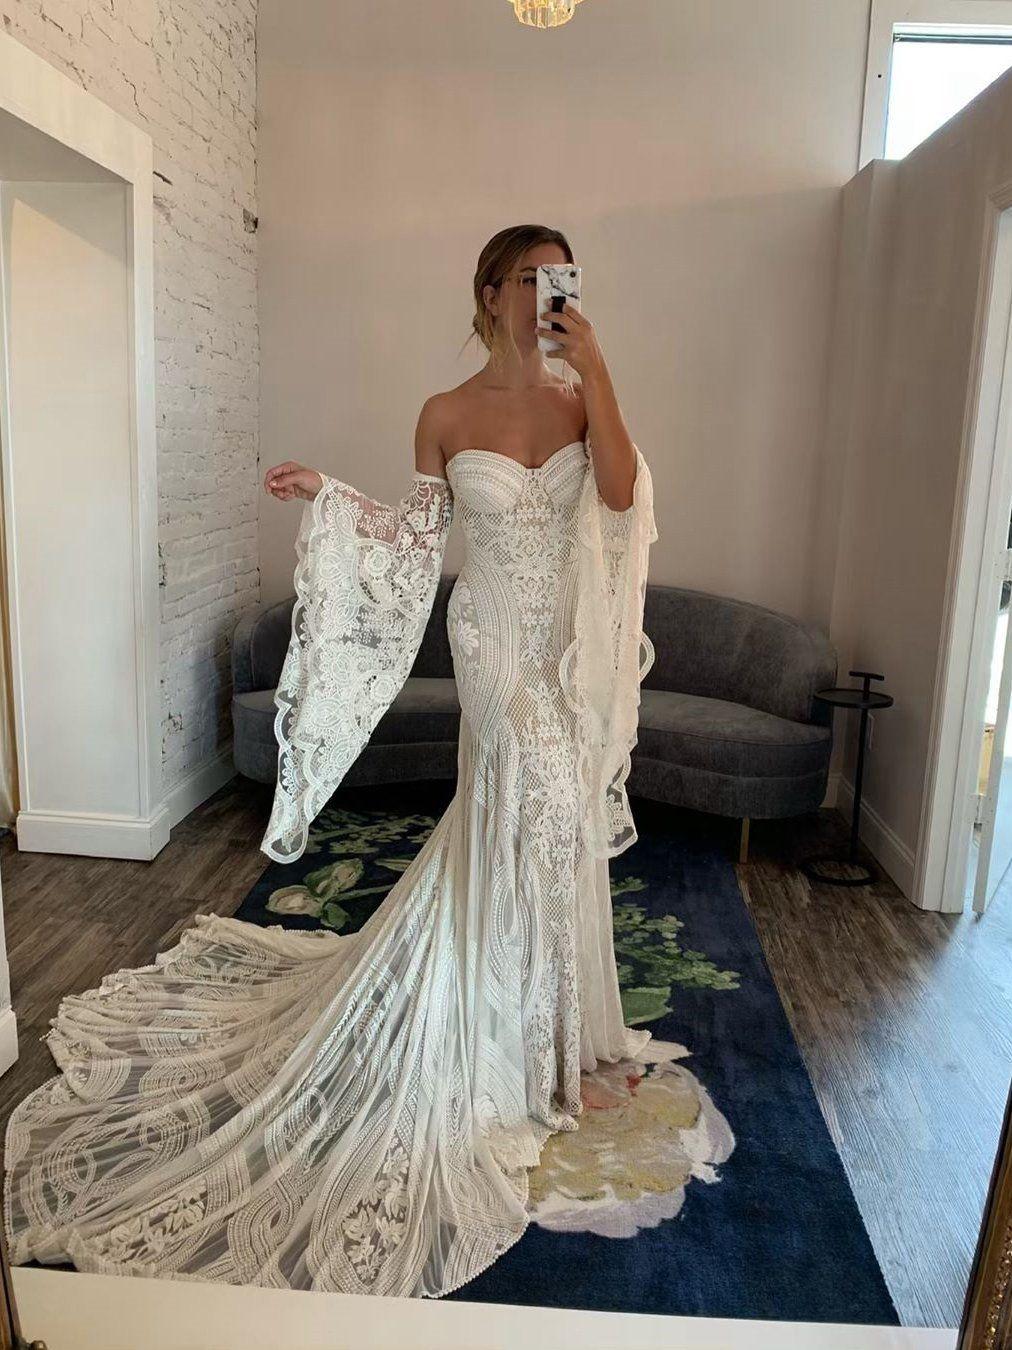 Chic Mermaid Boho Lace Court Train Rustic Wedding Dress Sew057 Lavender Bridesmaid Dresses Wedding Guest Dress Summer Rustic Wedding Dresses [ 1350 x 1012 Pixel ]